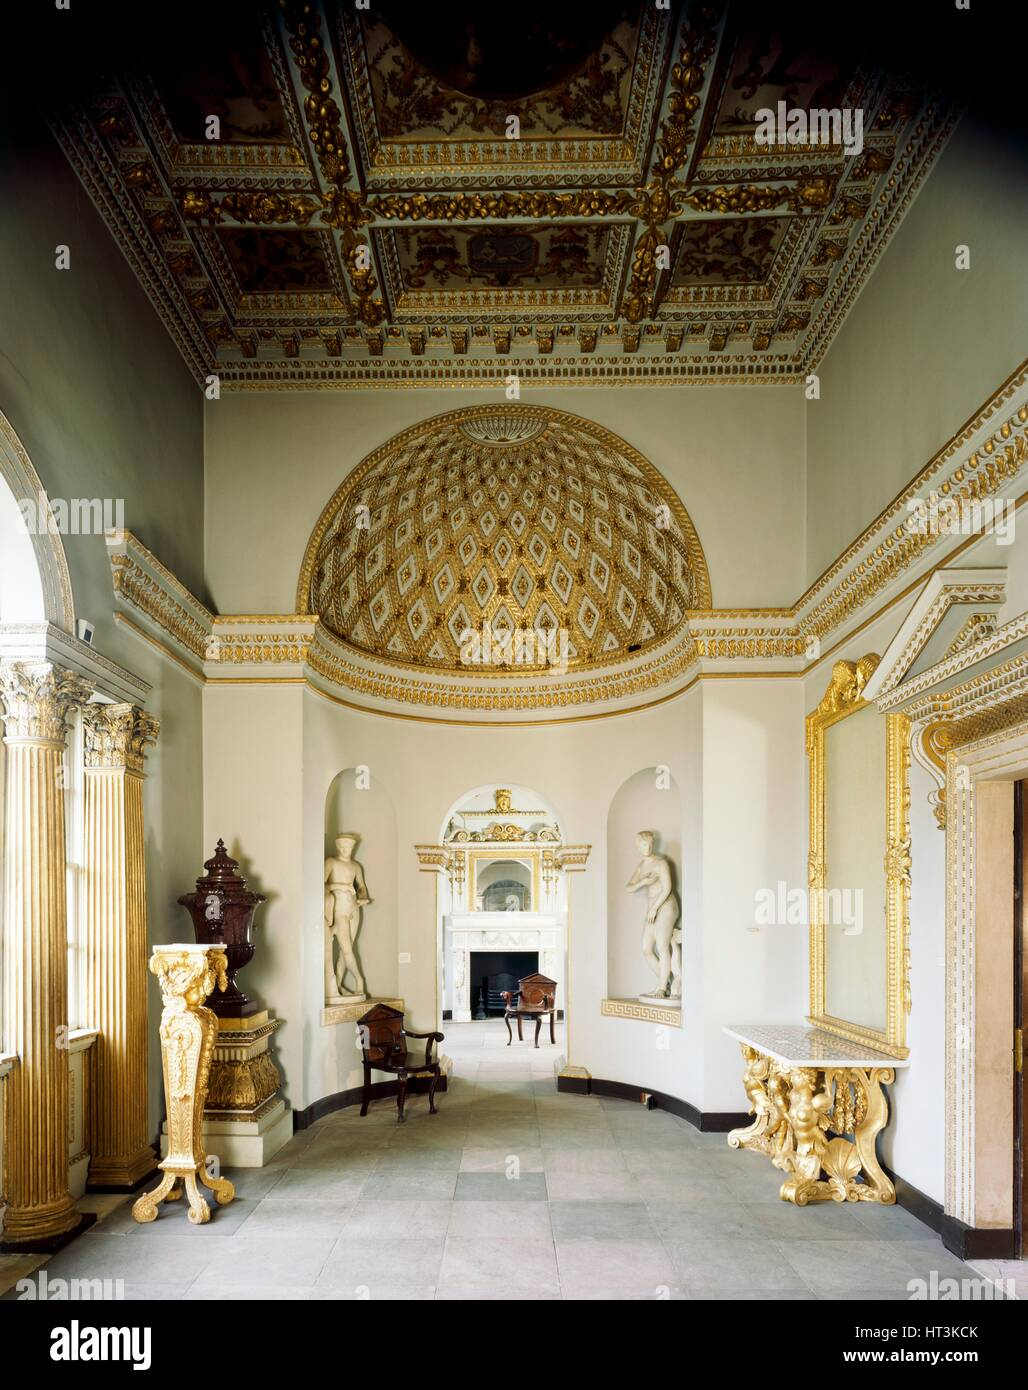 Chiswick House, c1990-2010. Artist: Nigel Corrie. - Stock Image